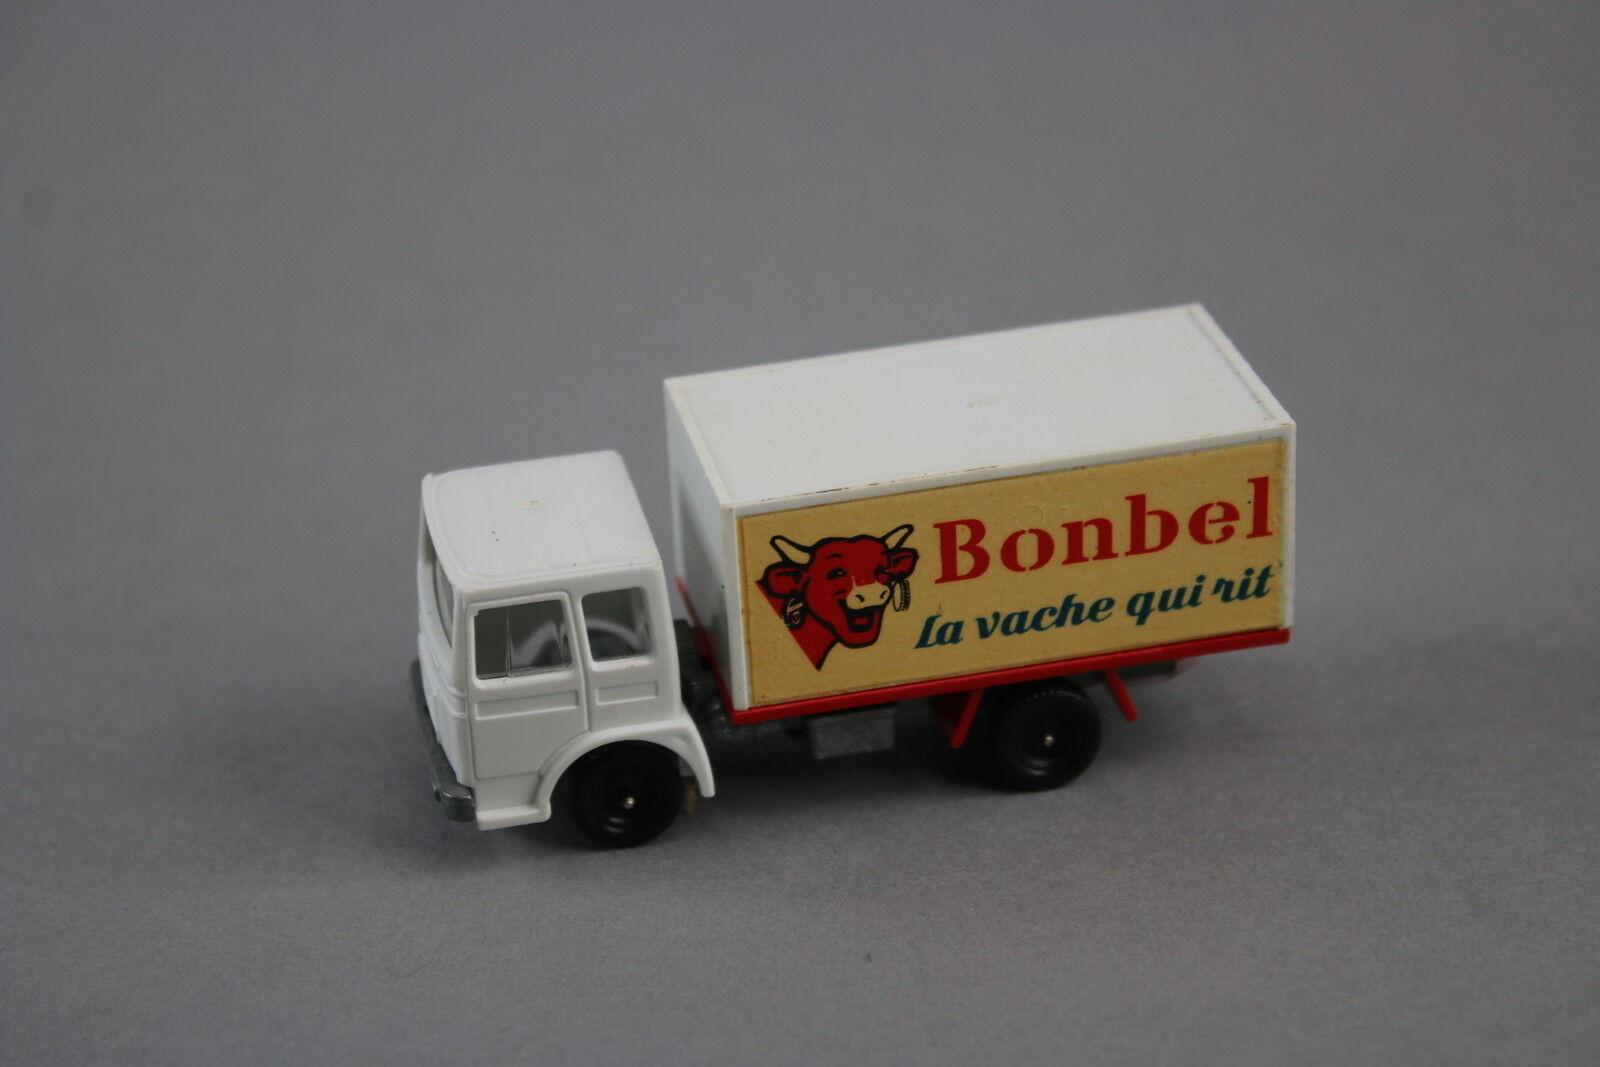 V572 champion 73mm selten camion saviem sm 300 bonbel vache qui rit fromage  - logo